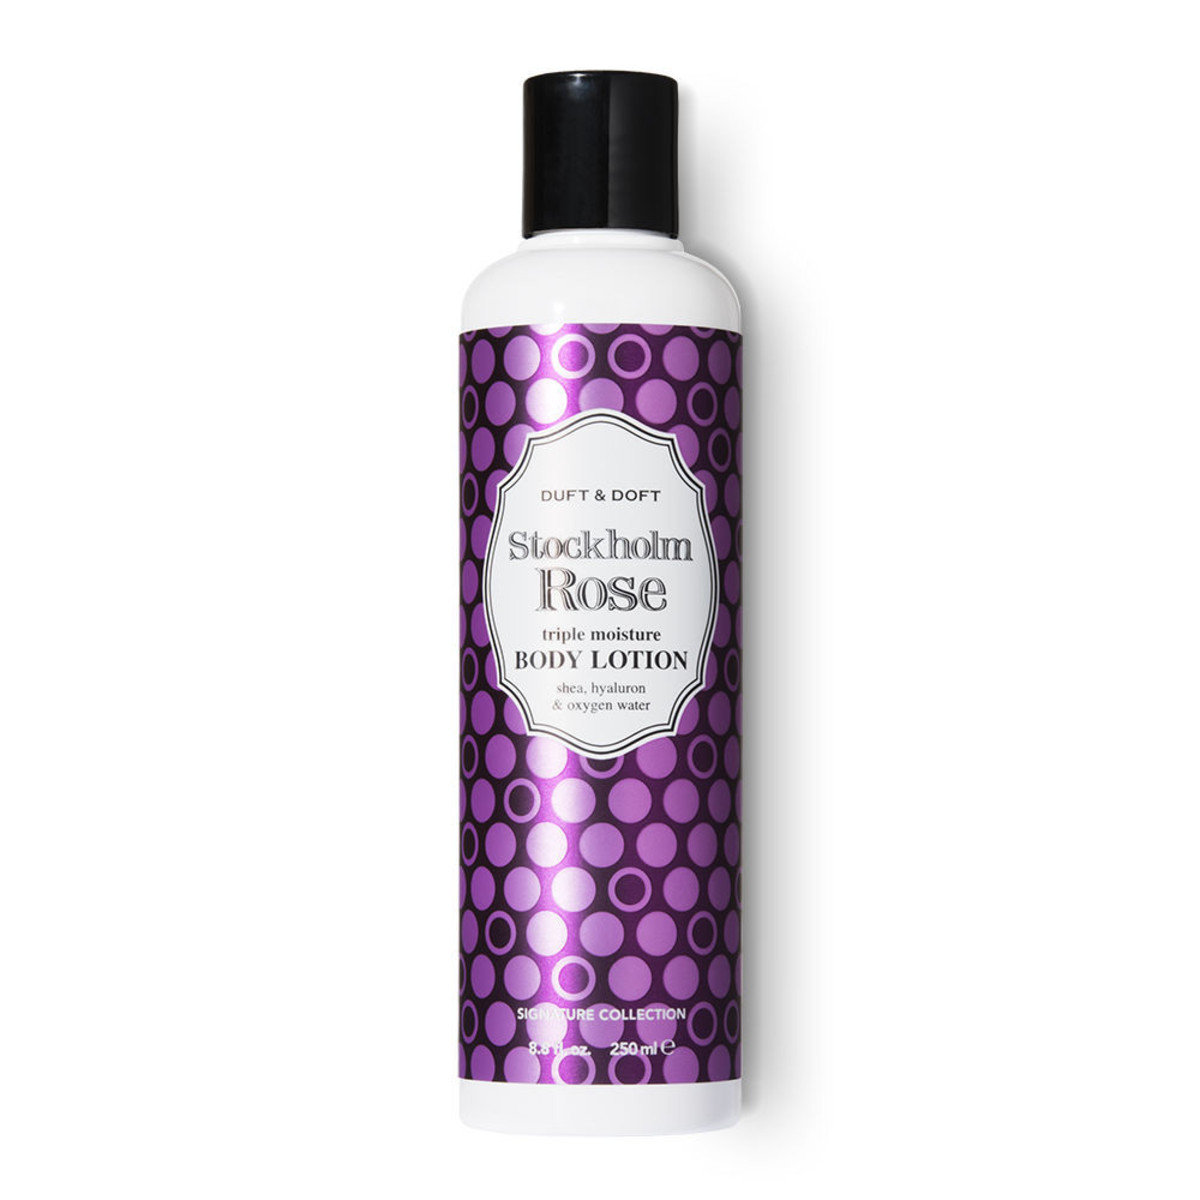 Stockholm Rose 三重保濕身體潤膚乳